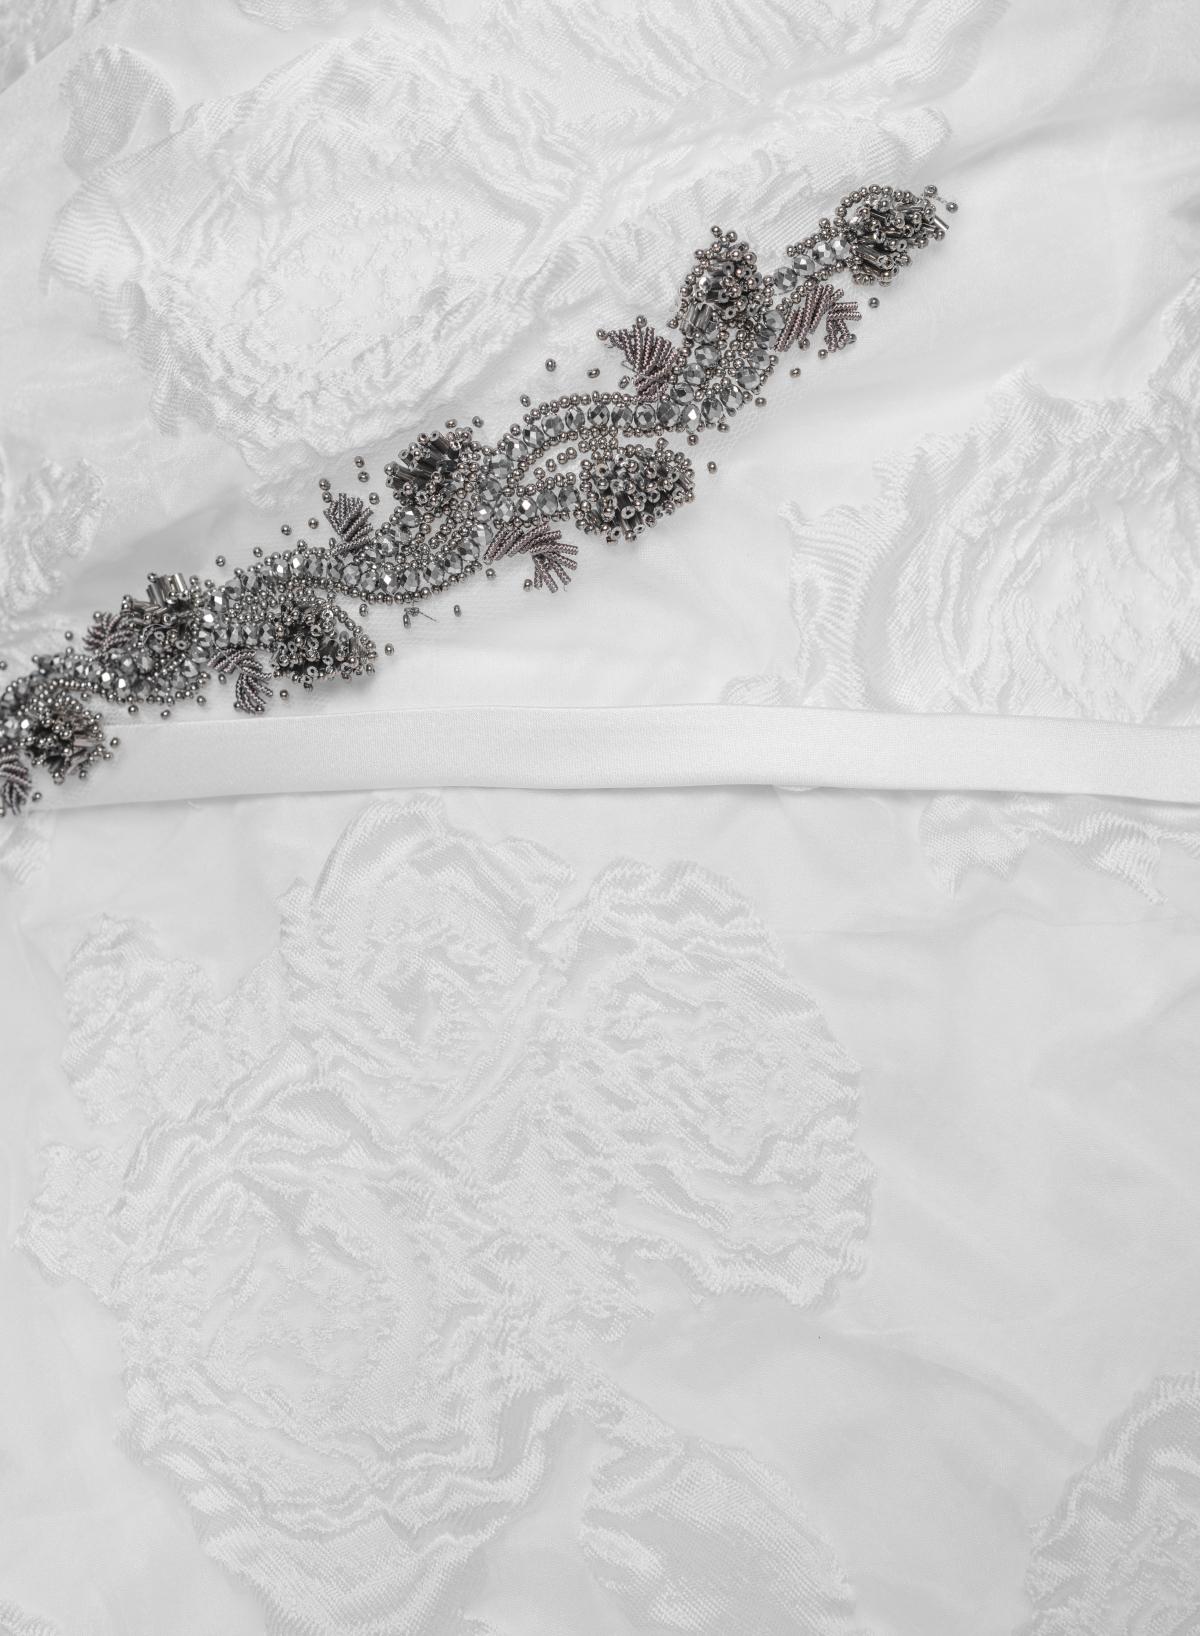 imagen-vestido-astartea-colección-hoovervirtuosity-Inma-Saurina